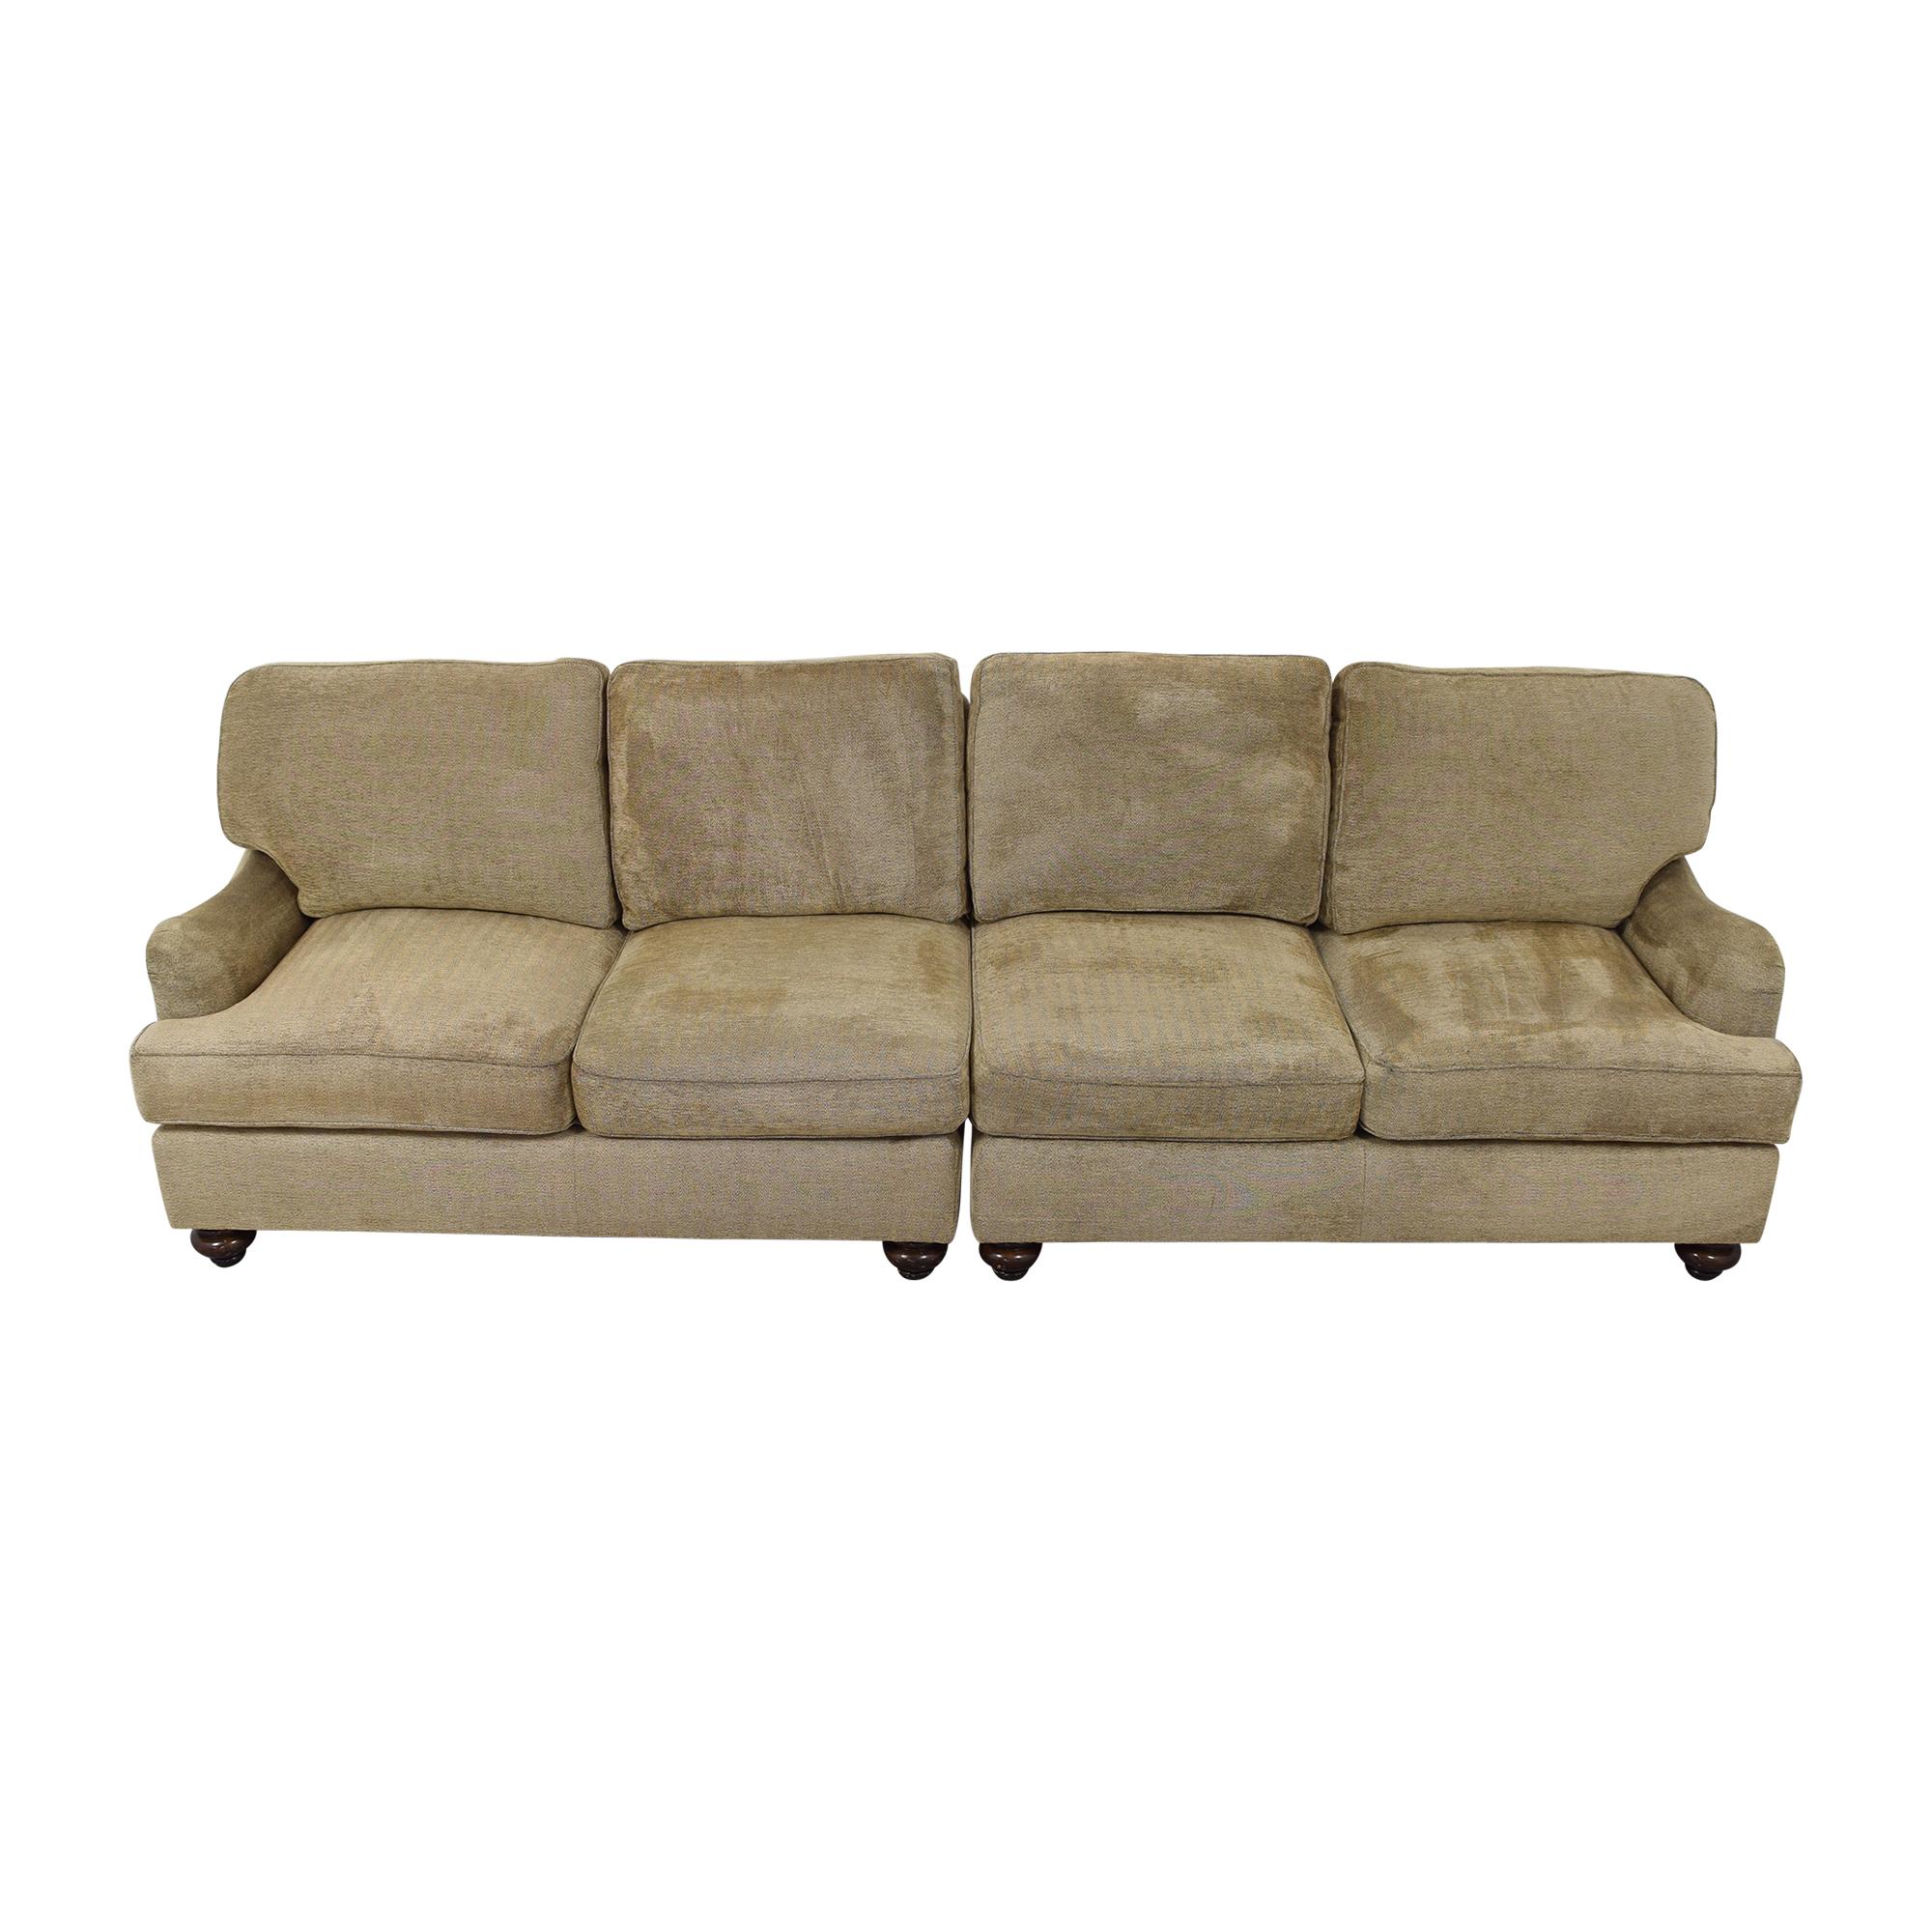 Henredon Furniture Mid-Century Modern Couch sale